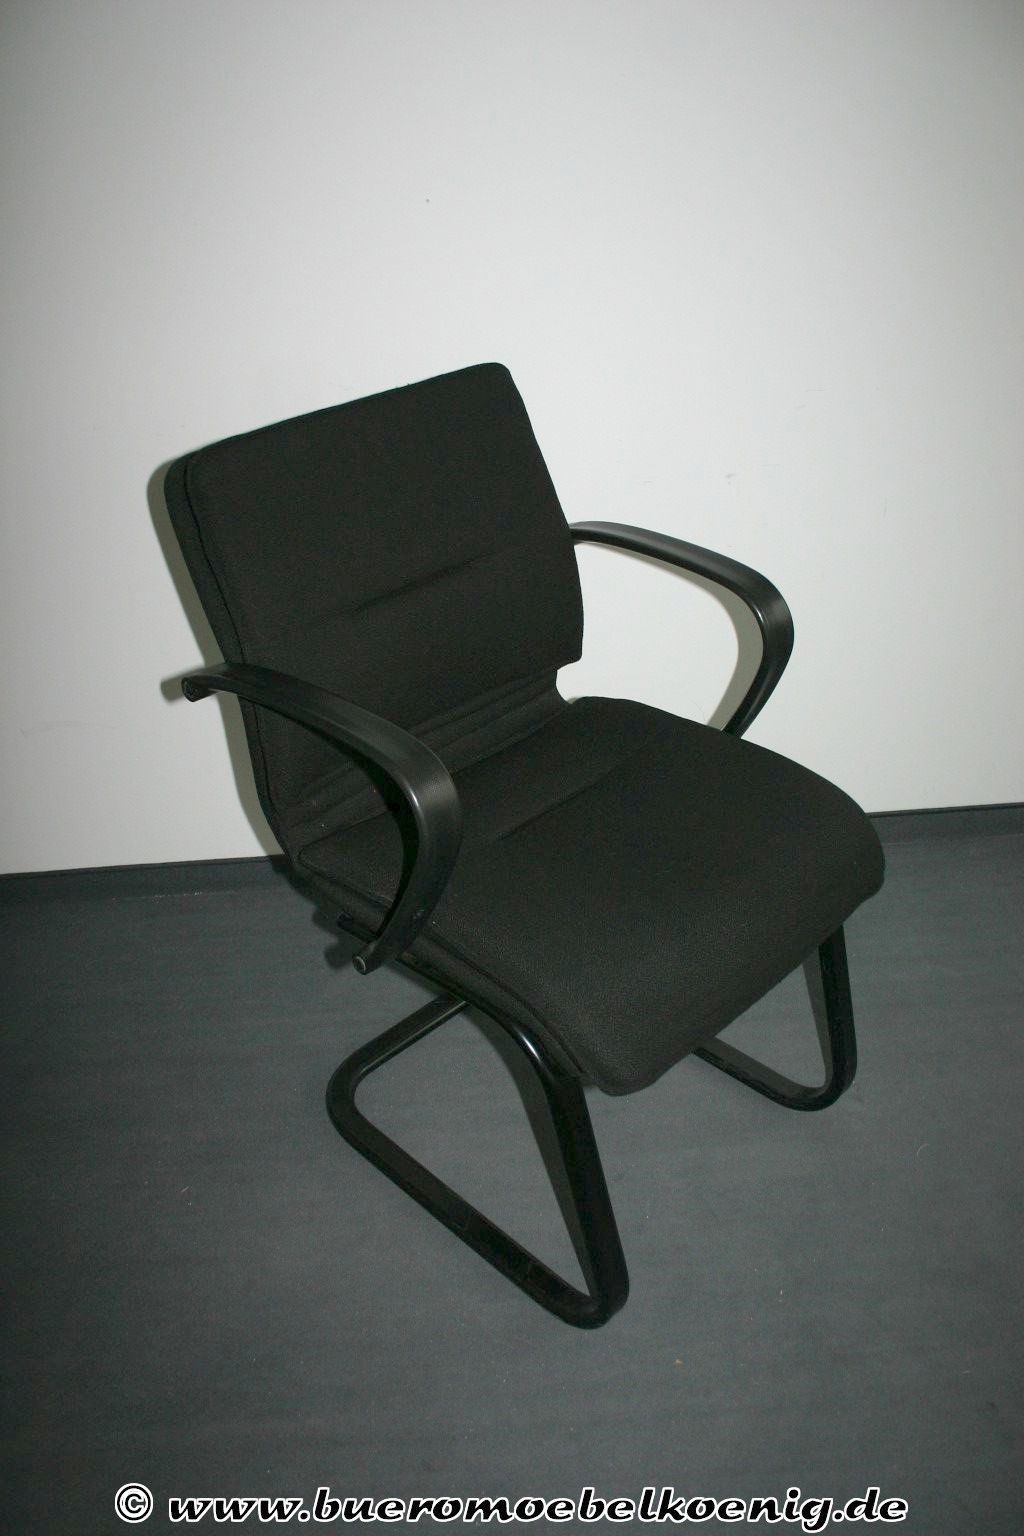 freischwinger in schwarz besucherst hle st hle unsere kategorien. Black Bedroom Furniture Sets. Home Design Ideas